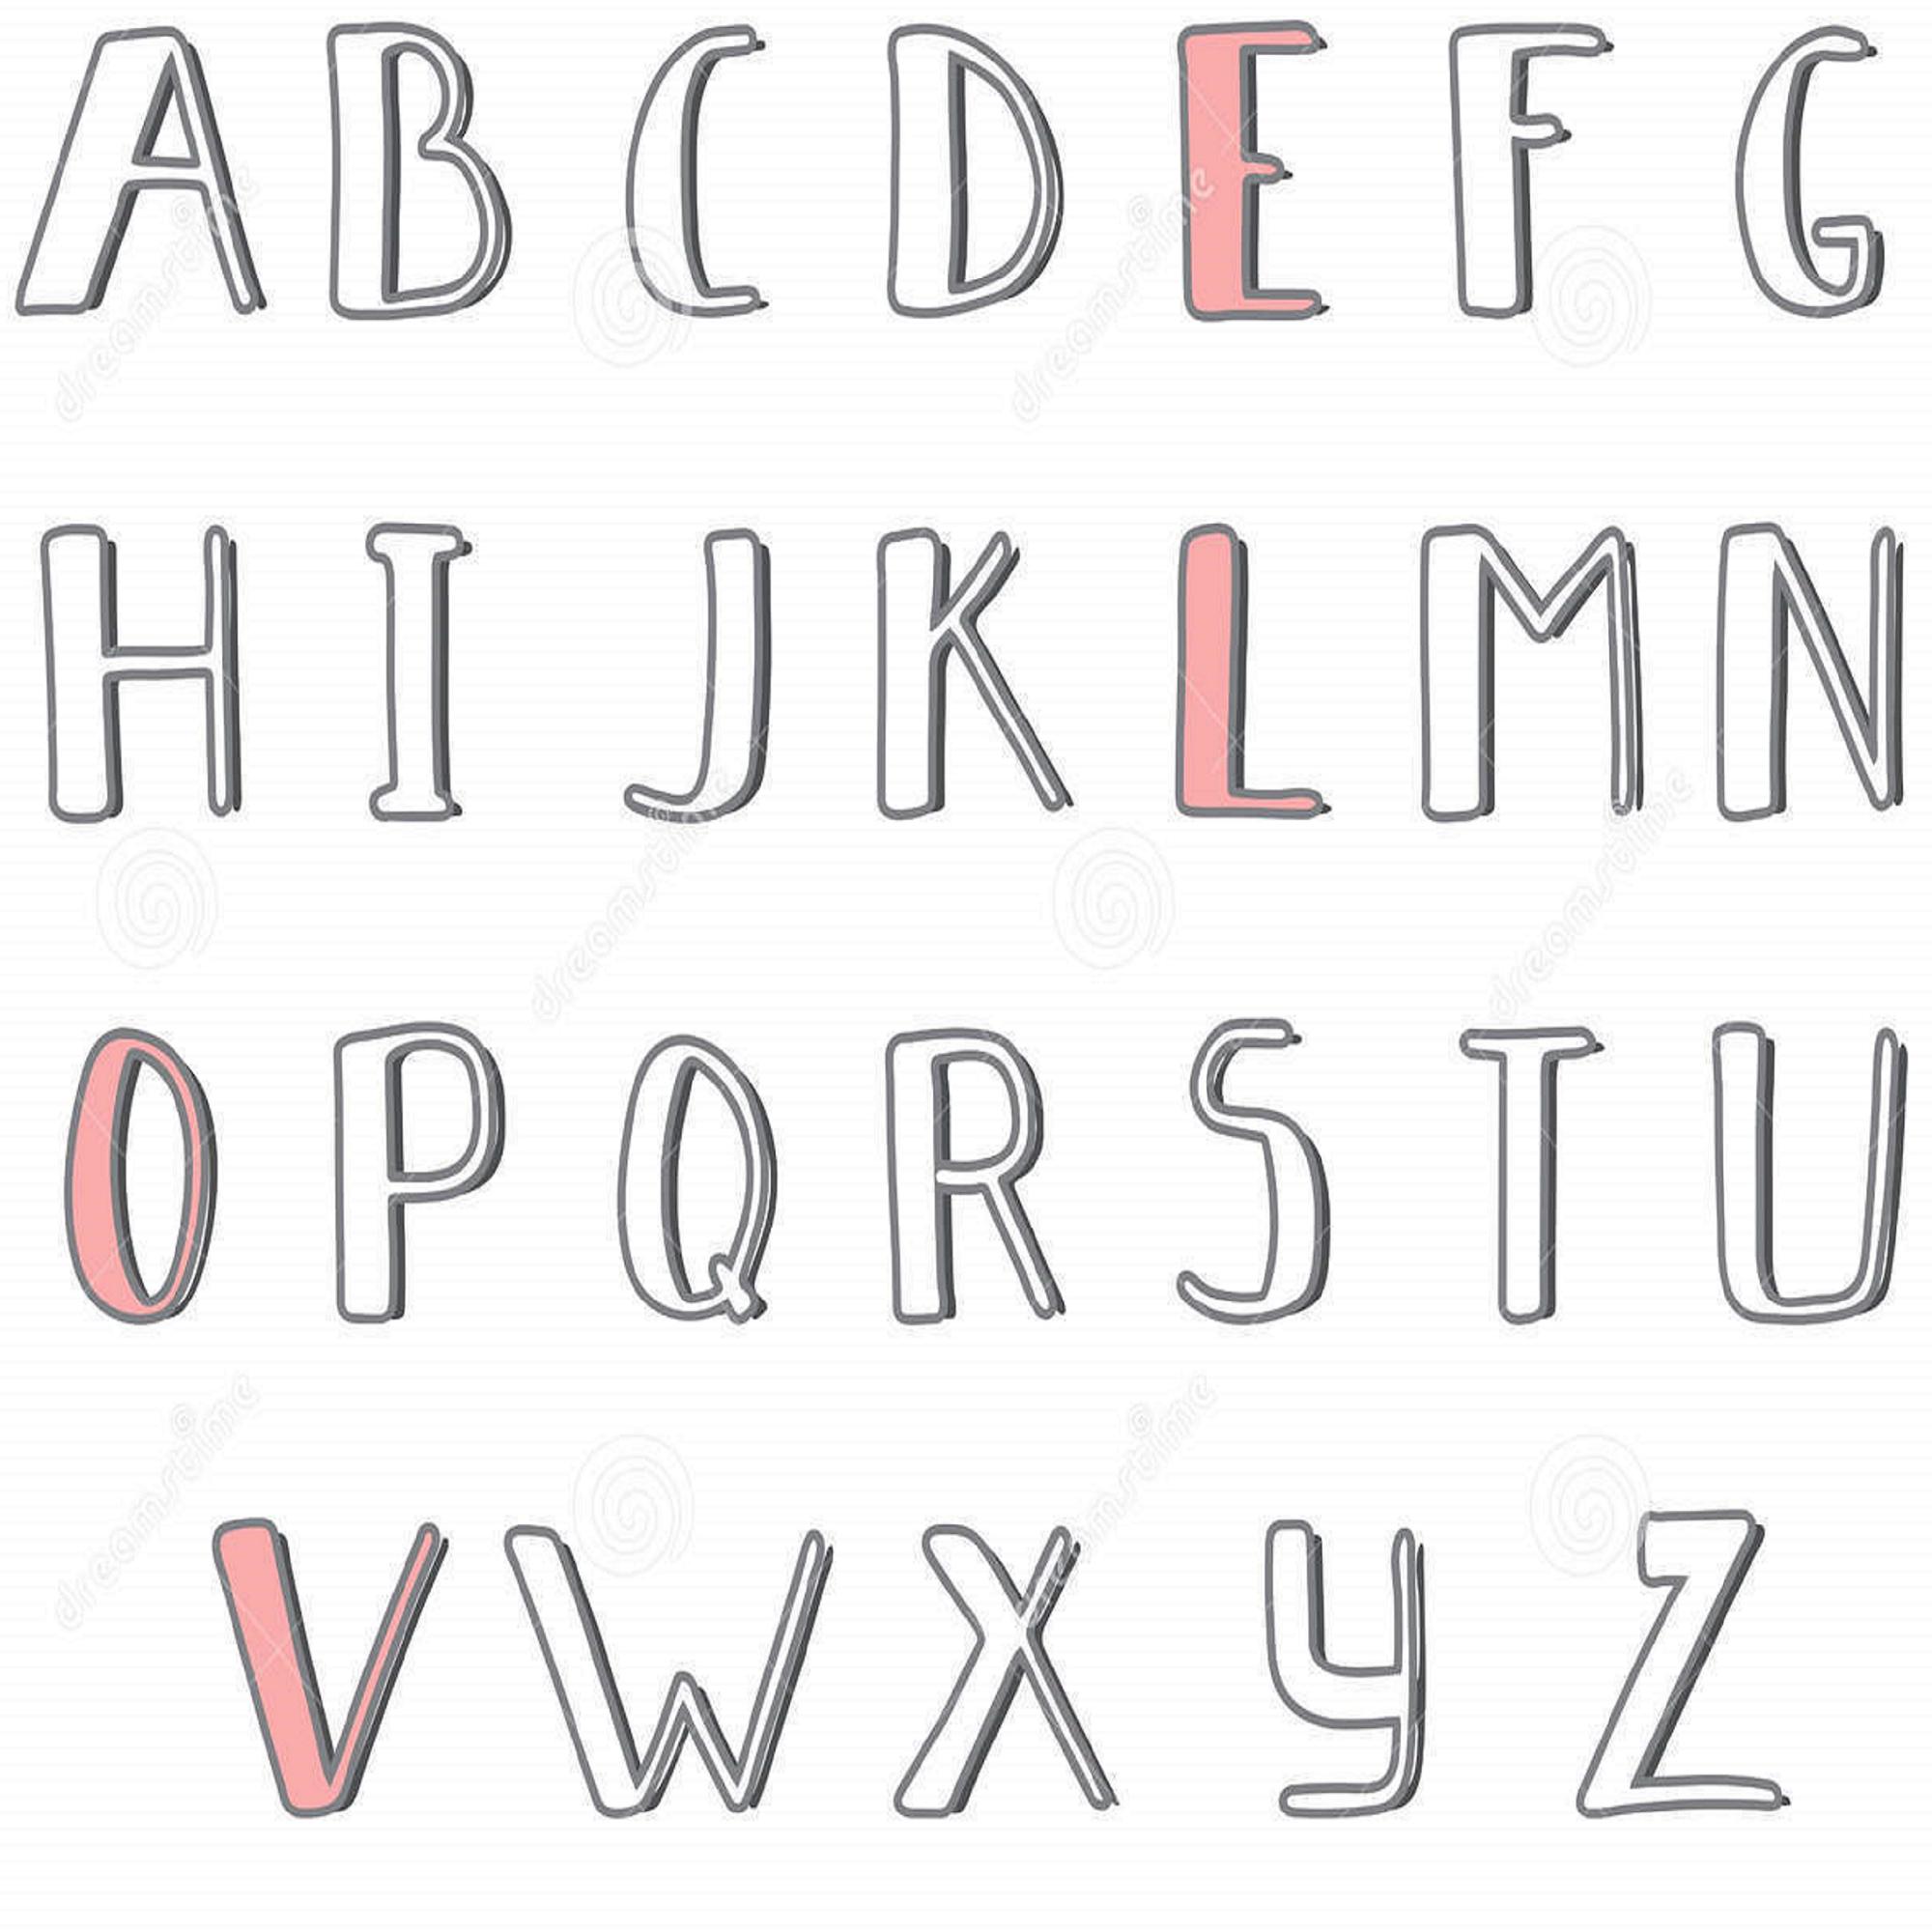 A-Z Handwritten Alphabets in  csv format | Kaggle